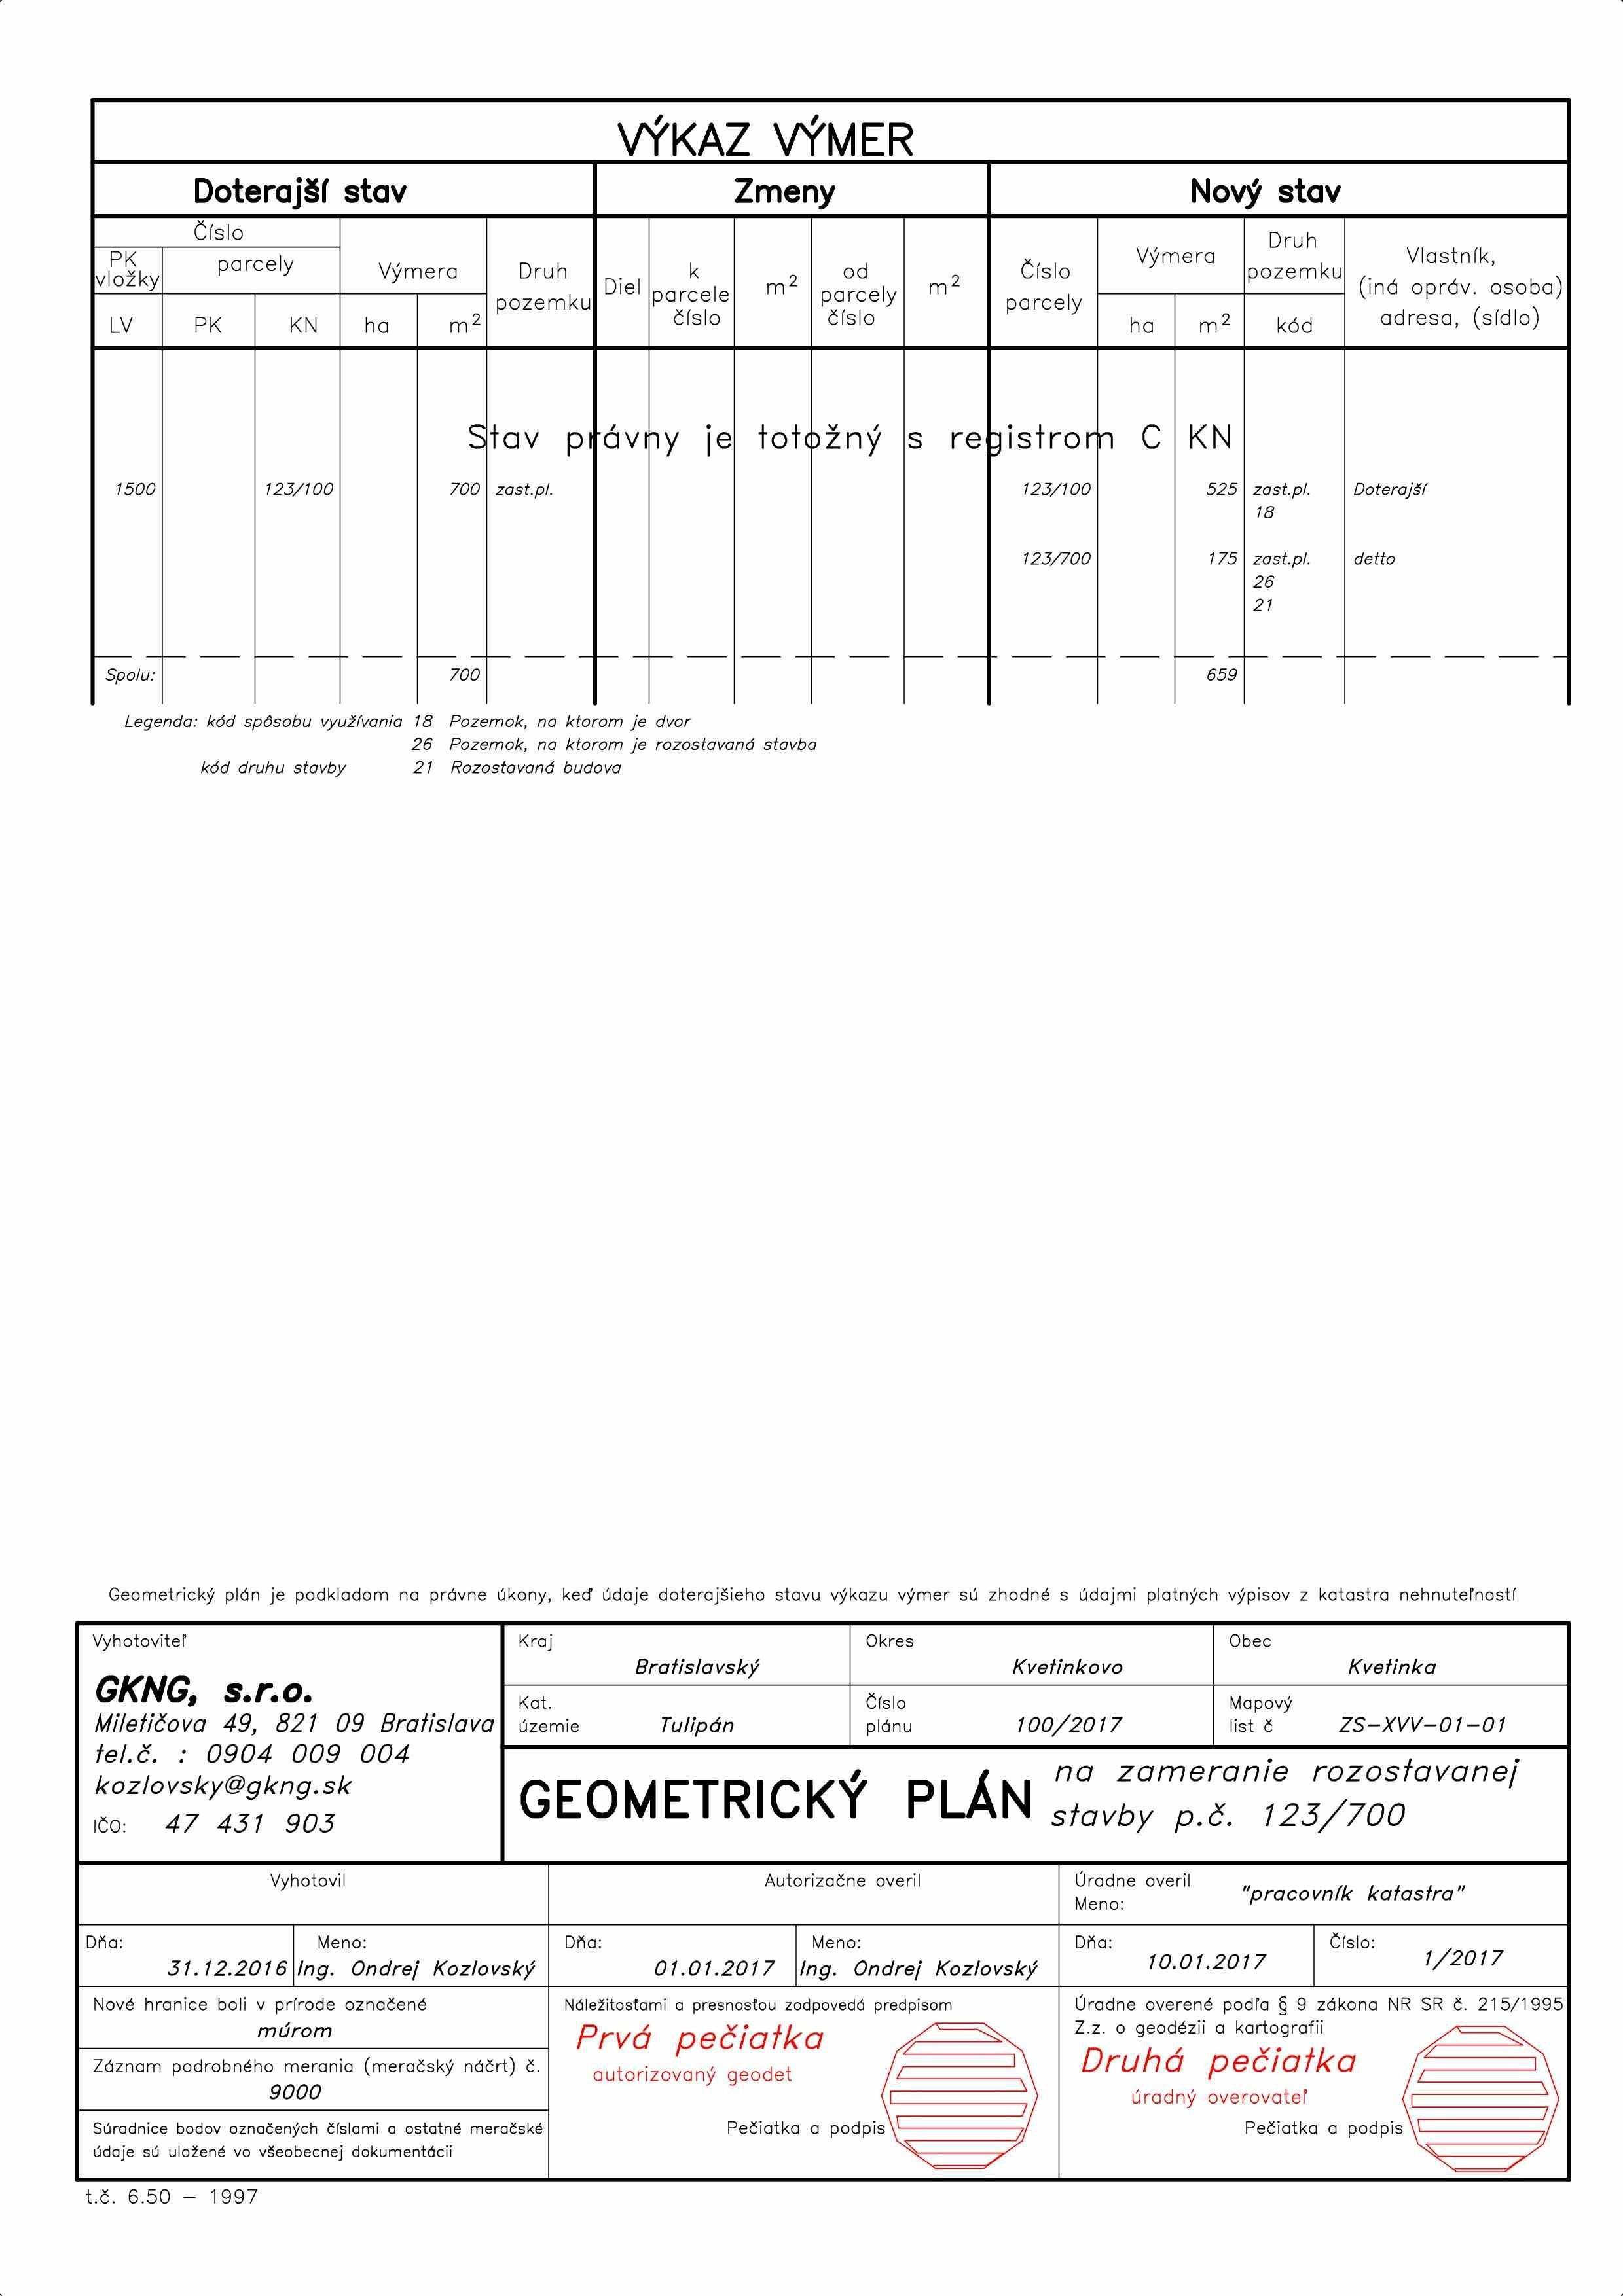 rozostavana stavba geometricky plan hlavicka vykaz vymer